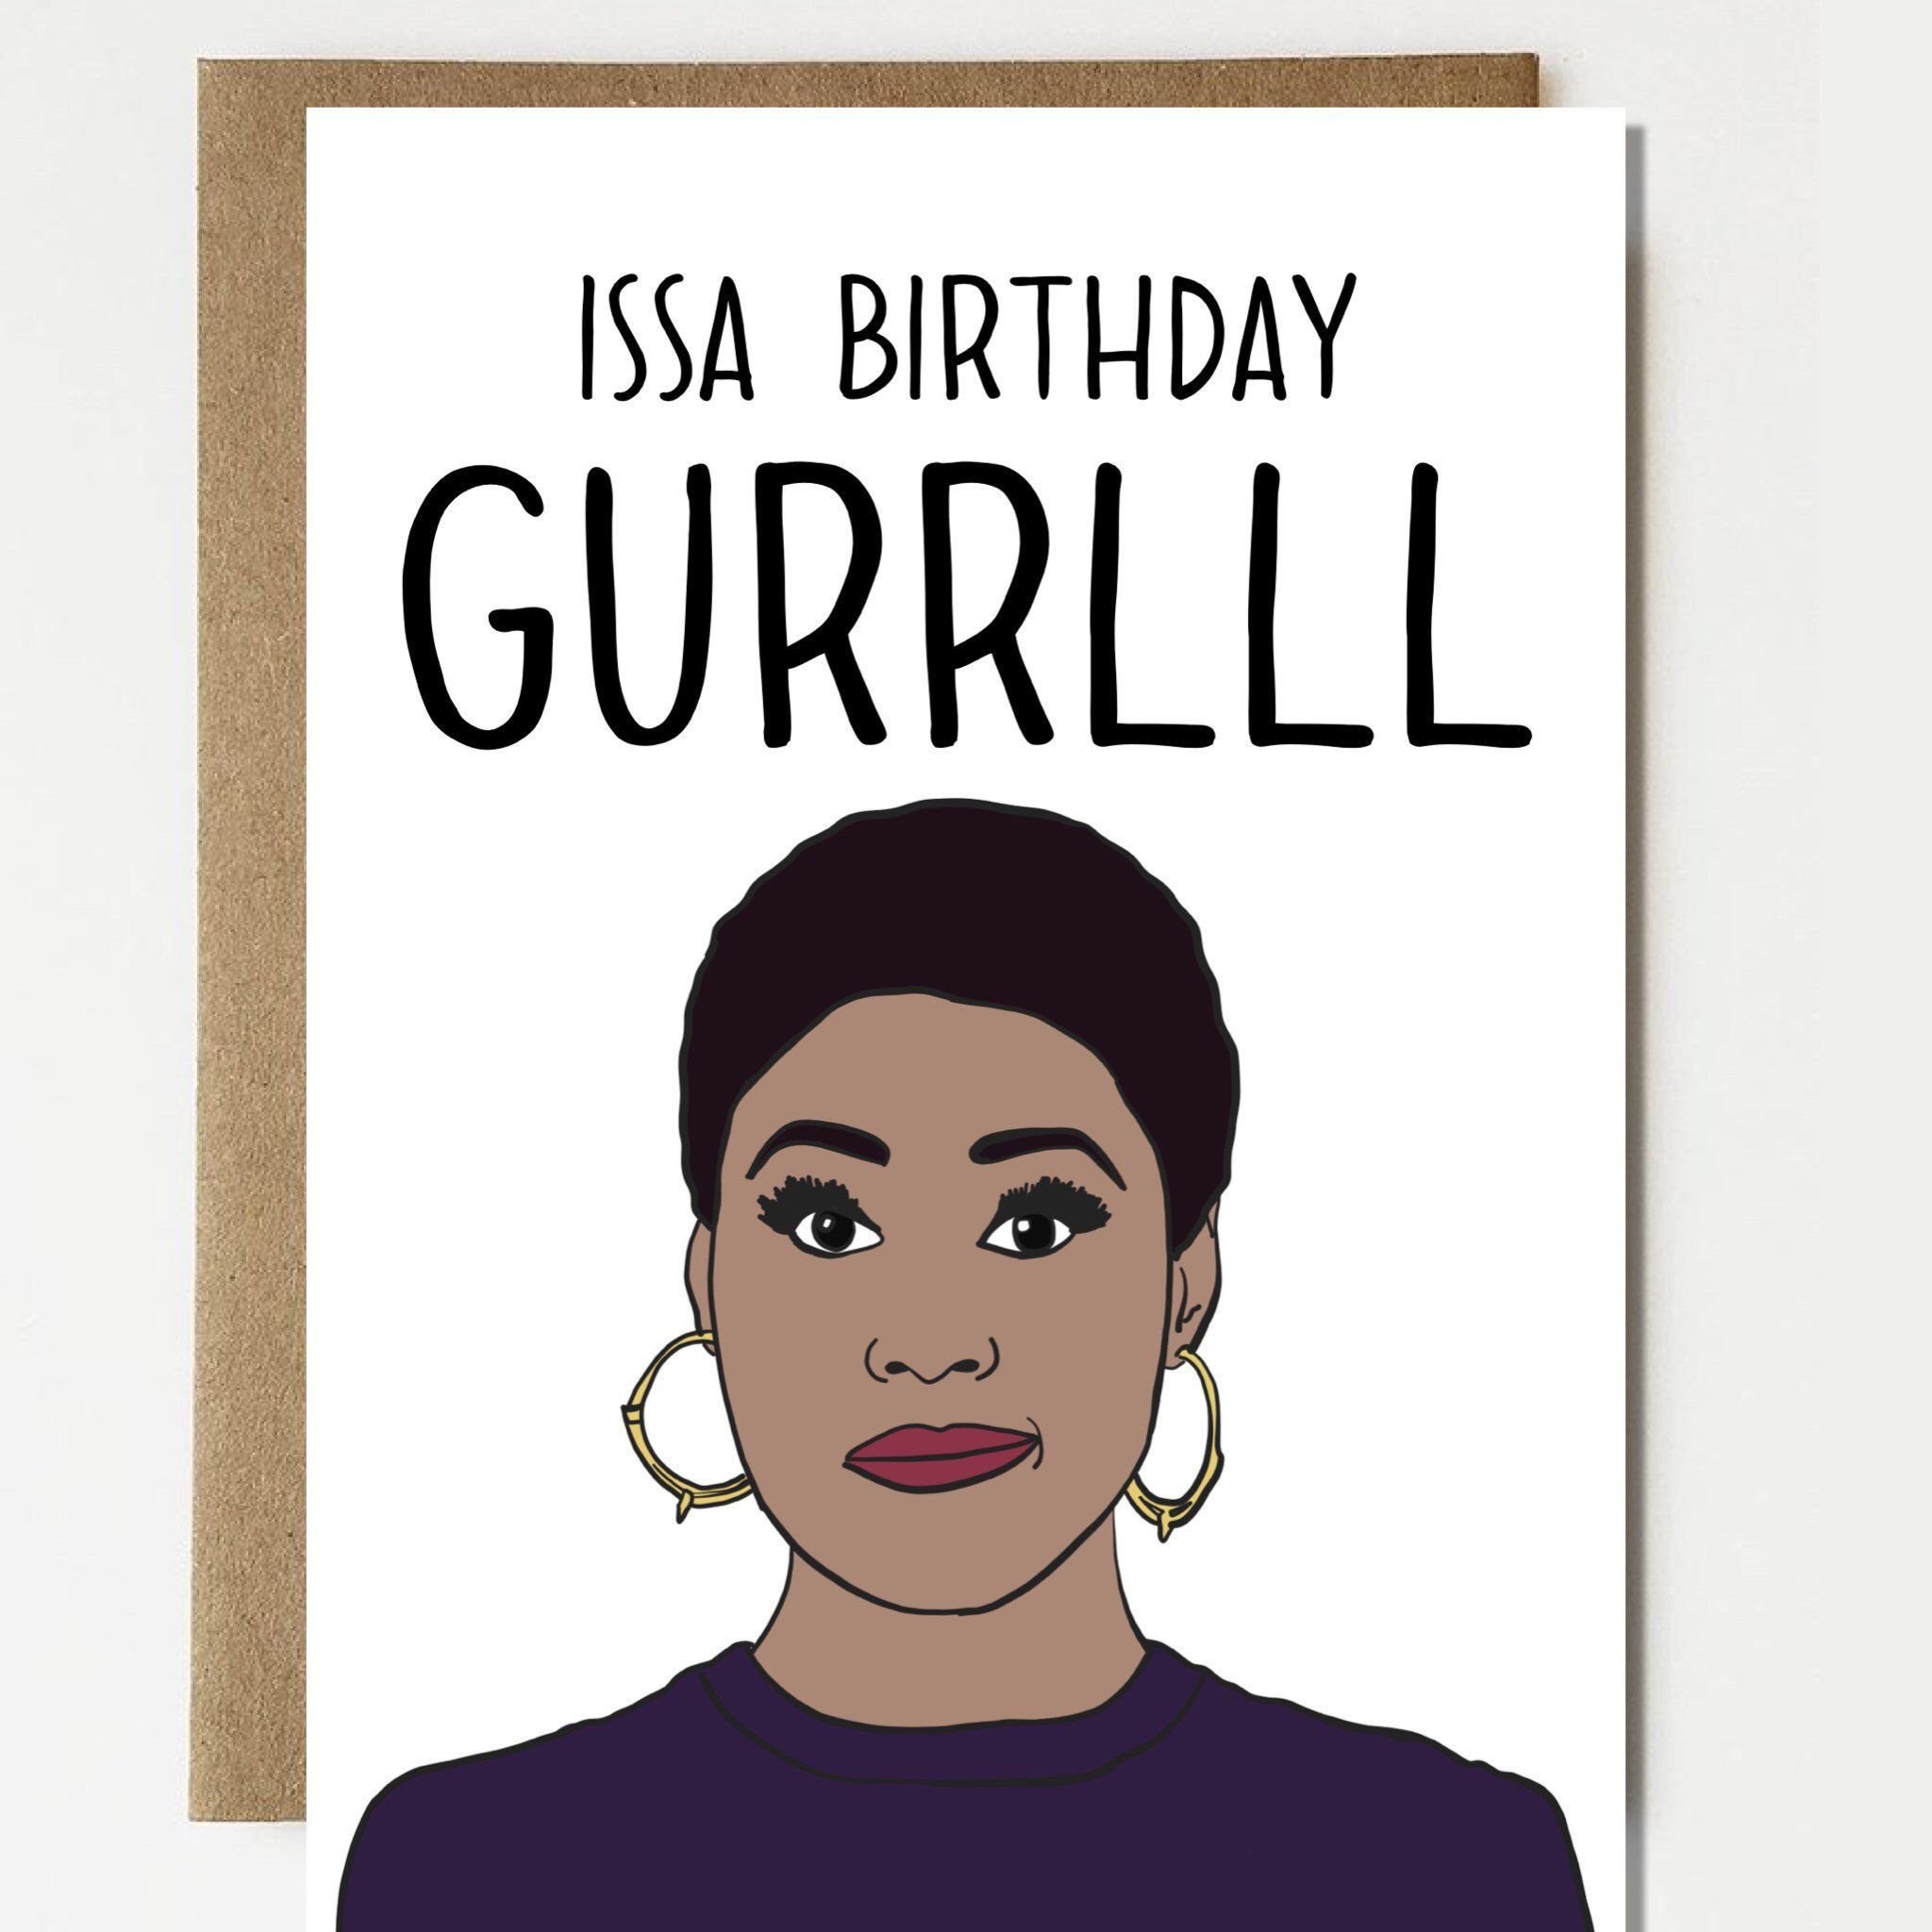 Issa Birthday Gurrlll Happy Birthday Card Issa Card Issa Etsy In 2021 Cool Birthday Cards Birthday Cards Happy Birthday African American